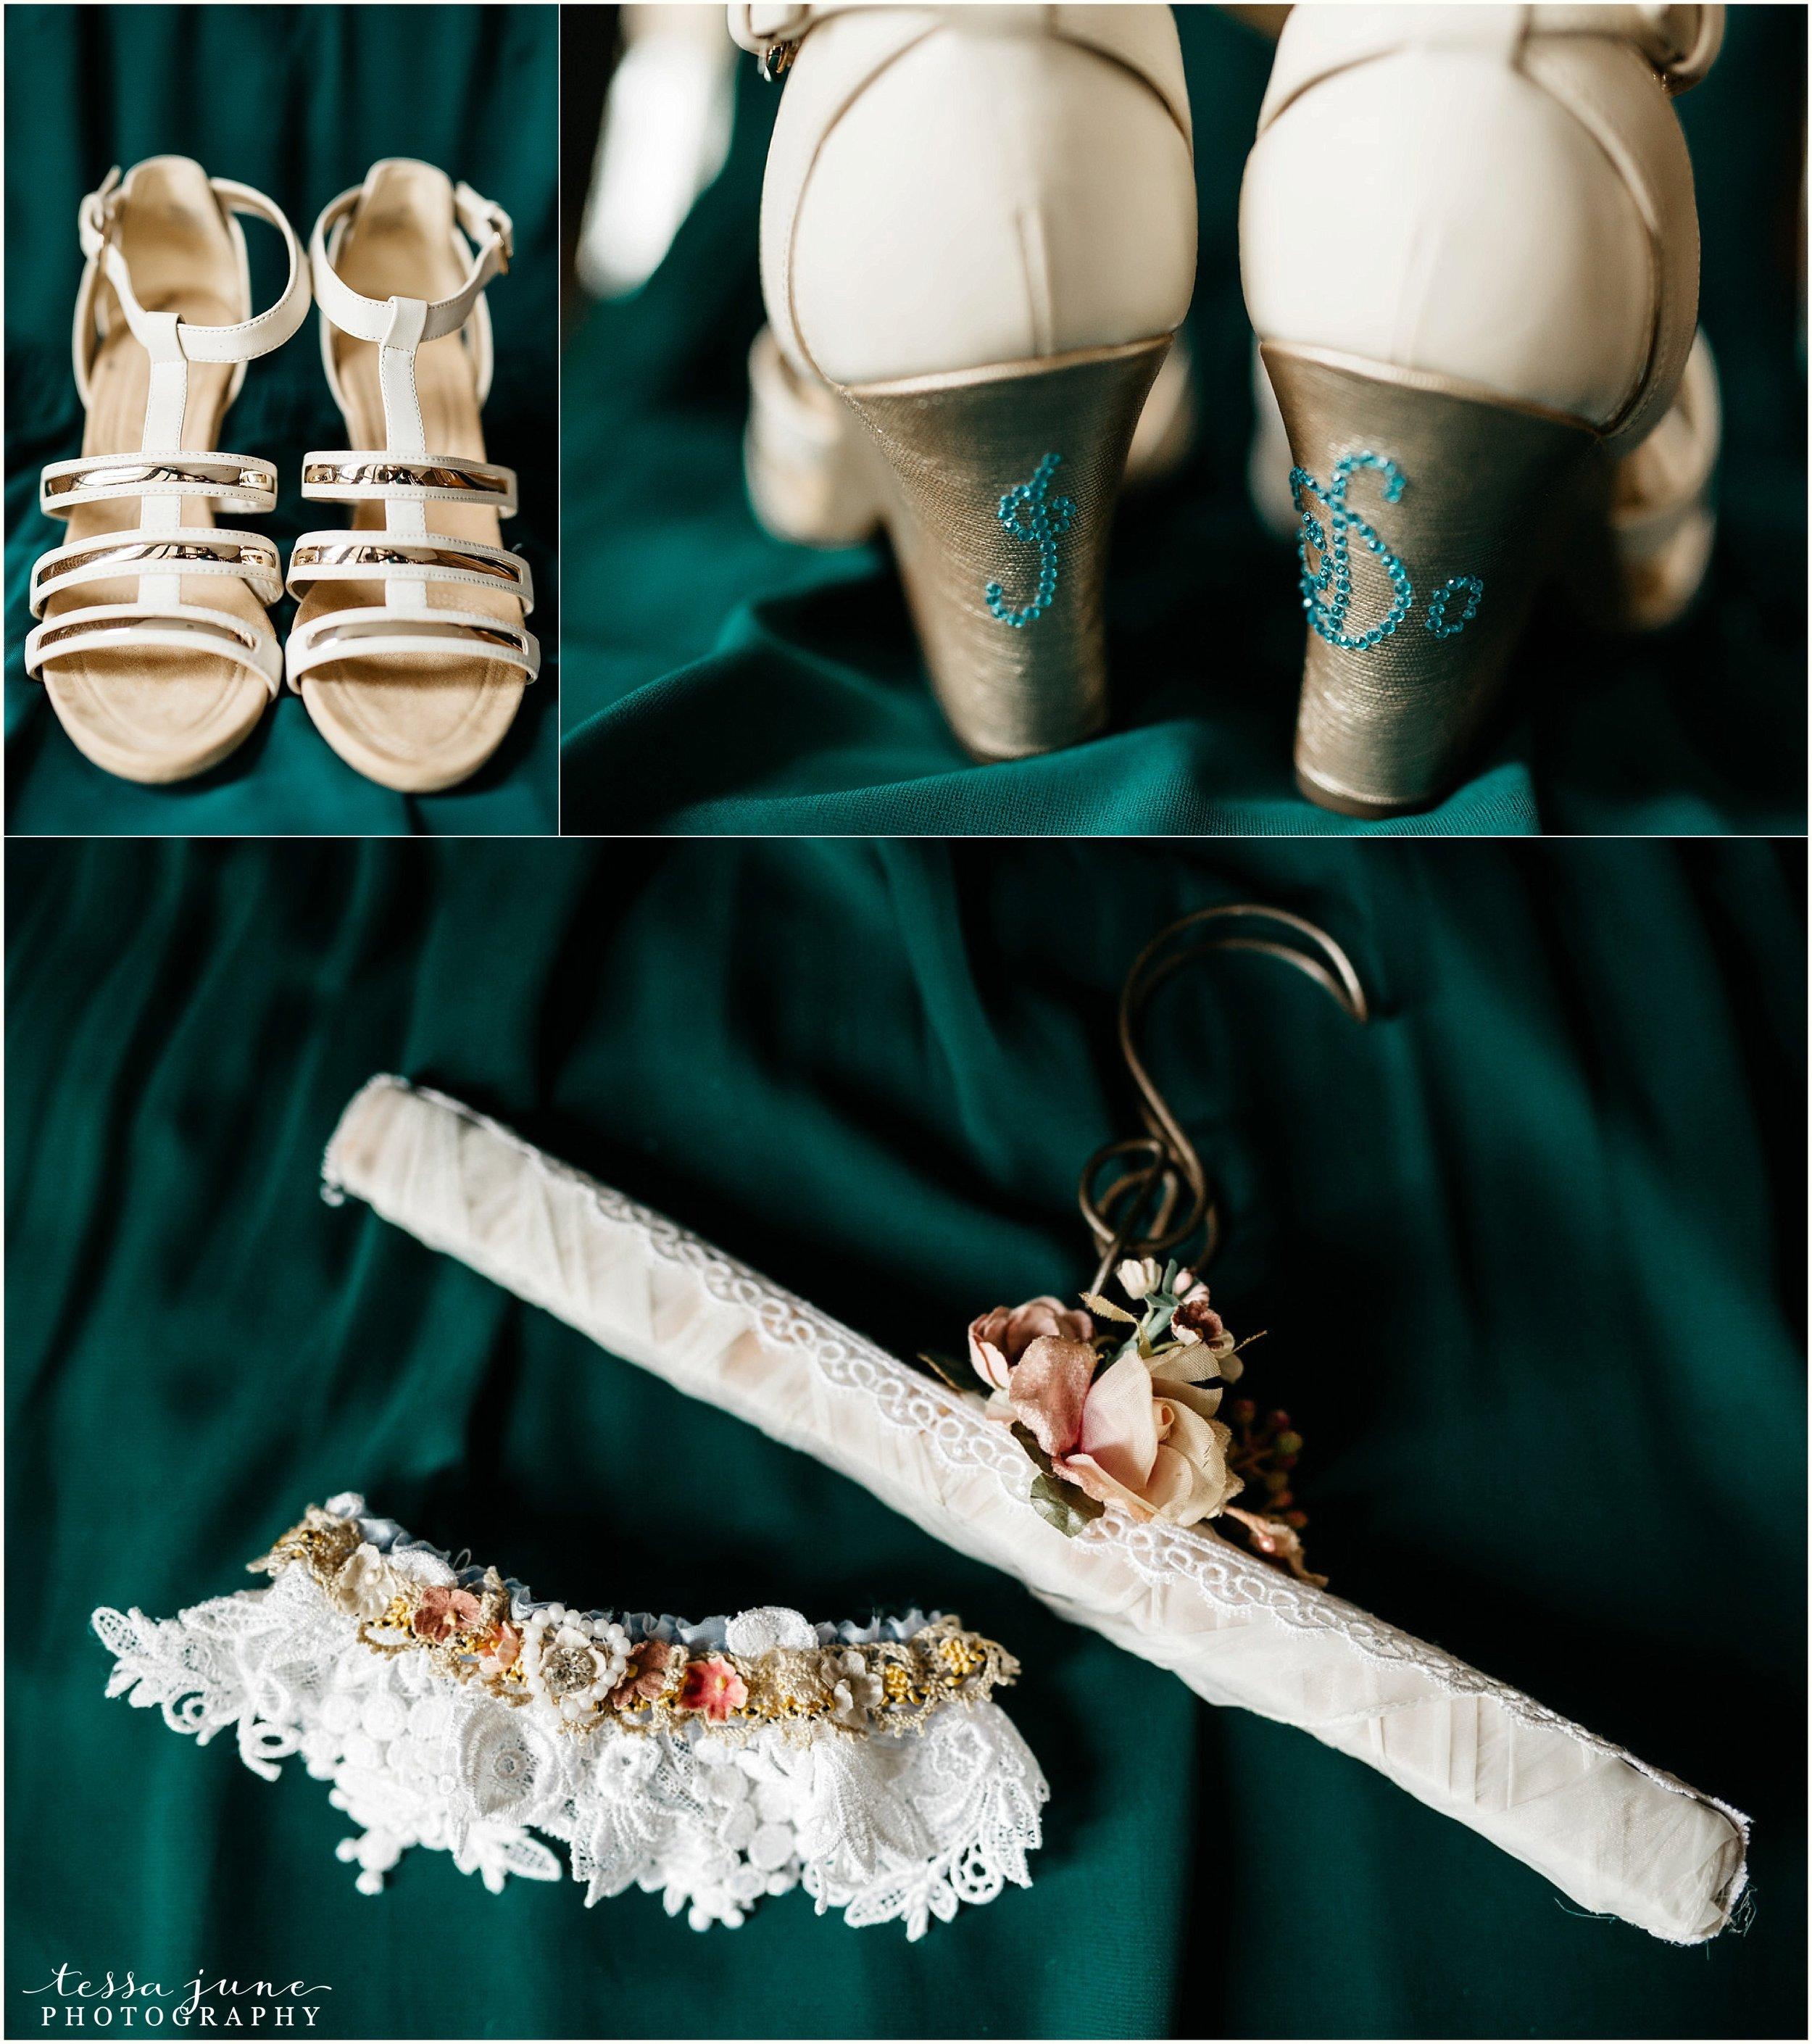 bohemian-minnesota-wedding-mismatched-bridesmaid-dresses-waterfall-st-cloud-tessa-june-photography-3.jpg